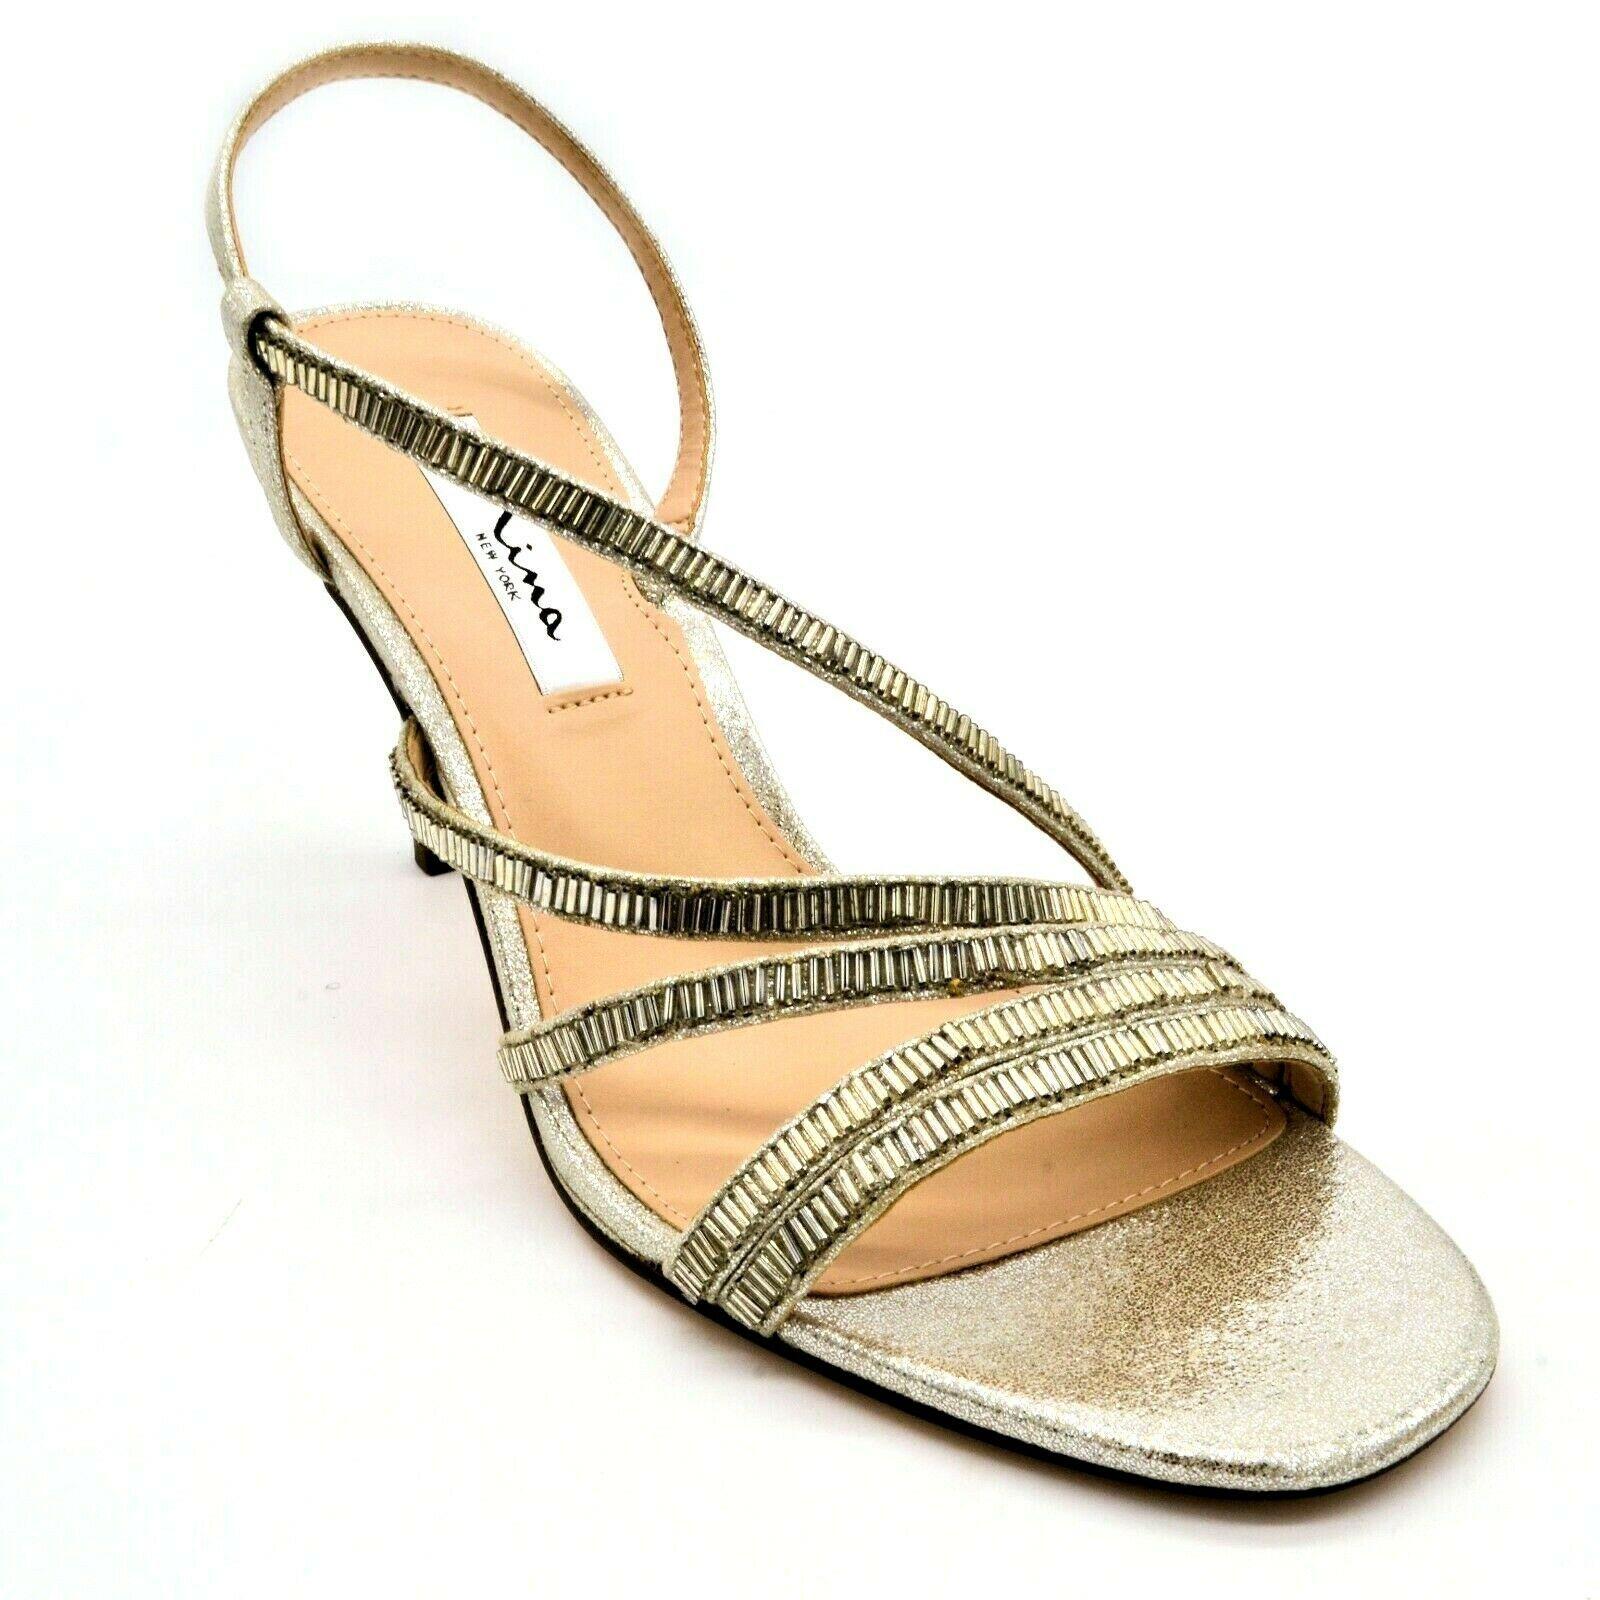 Nina New York Womens Sparkle Strappy Slingback Heels Sz 8.5M Silver Leather NEW - $32.66